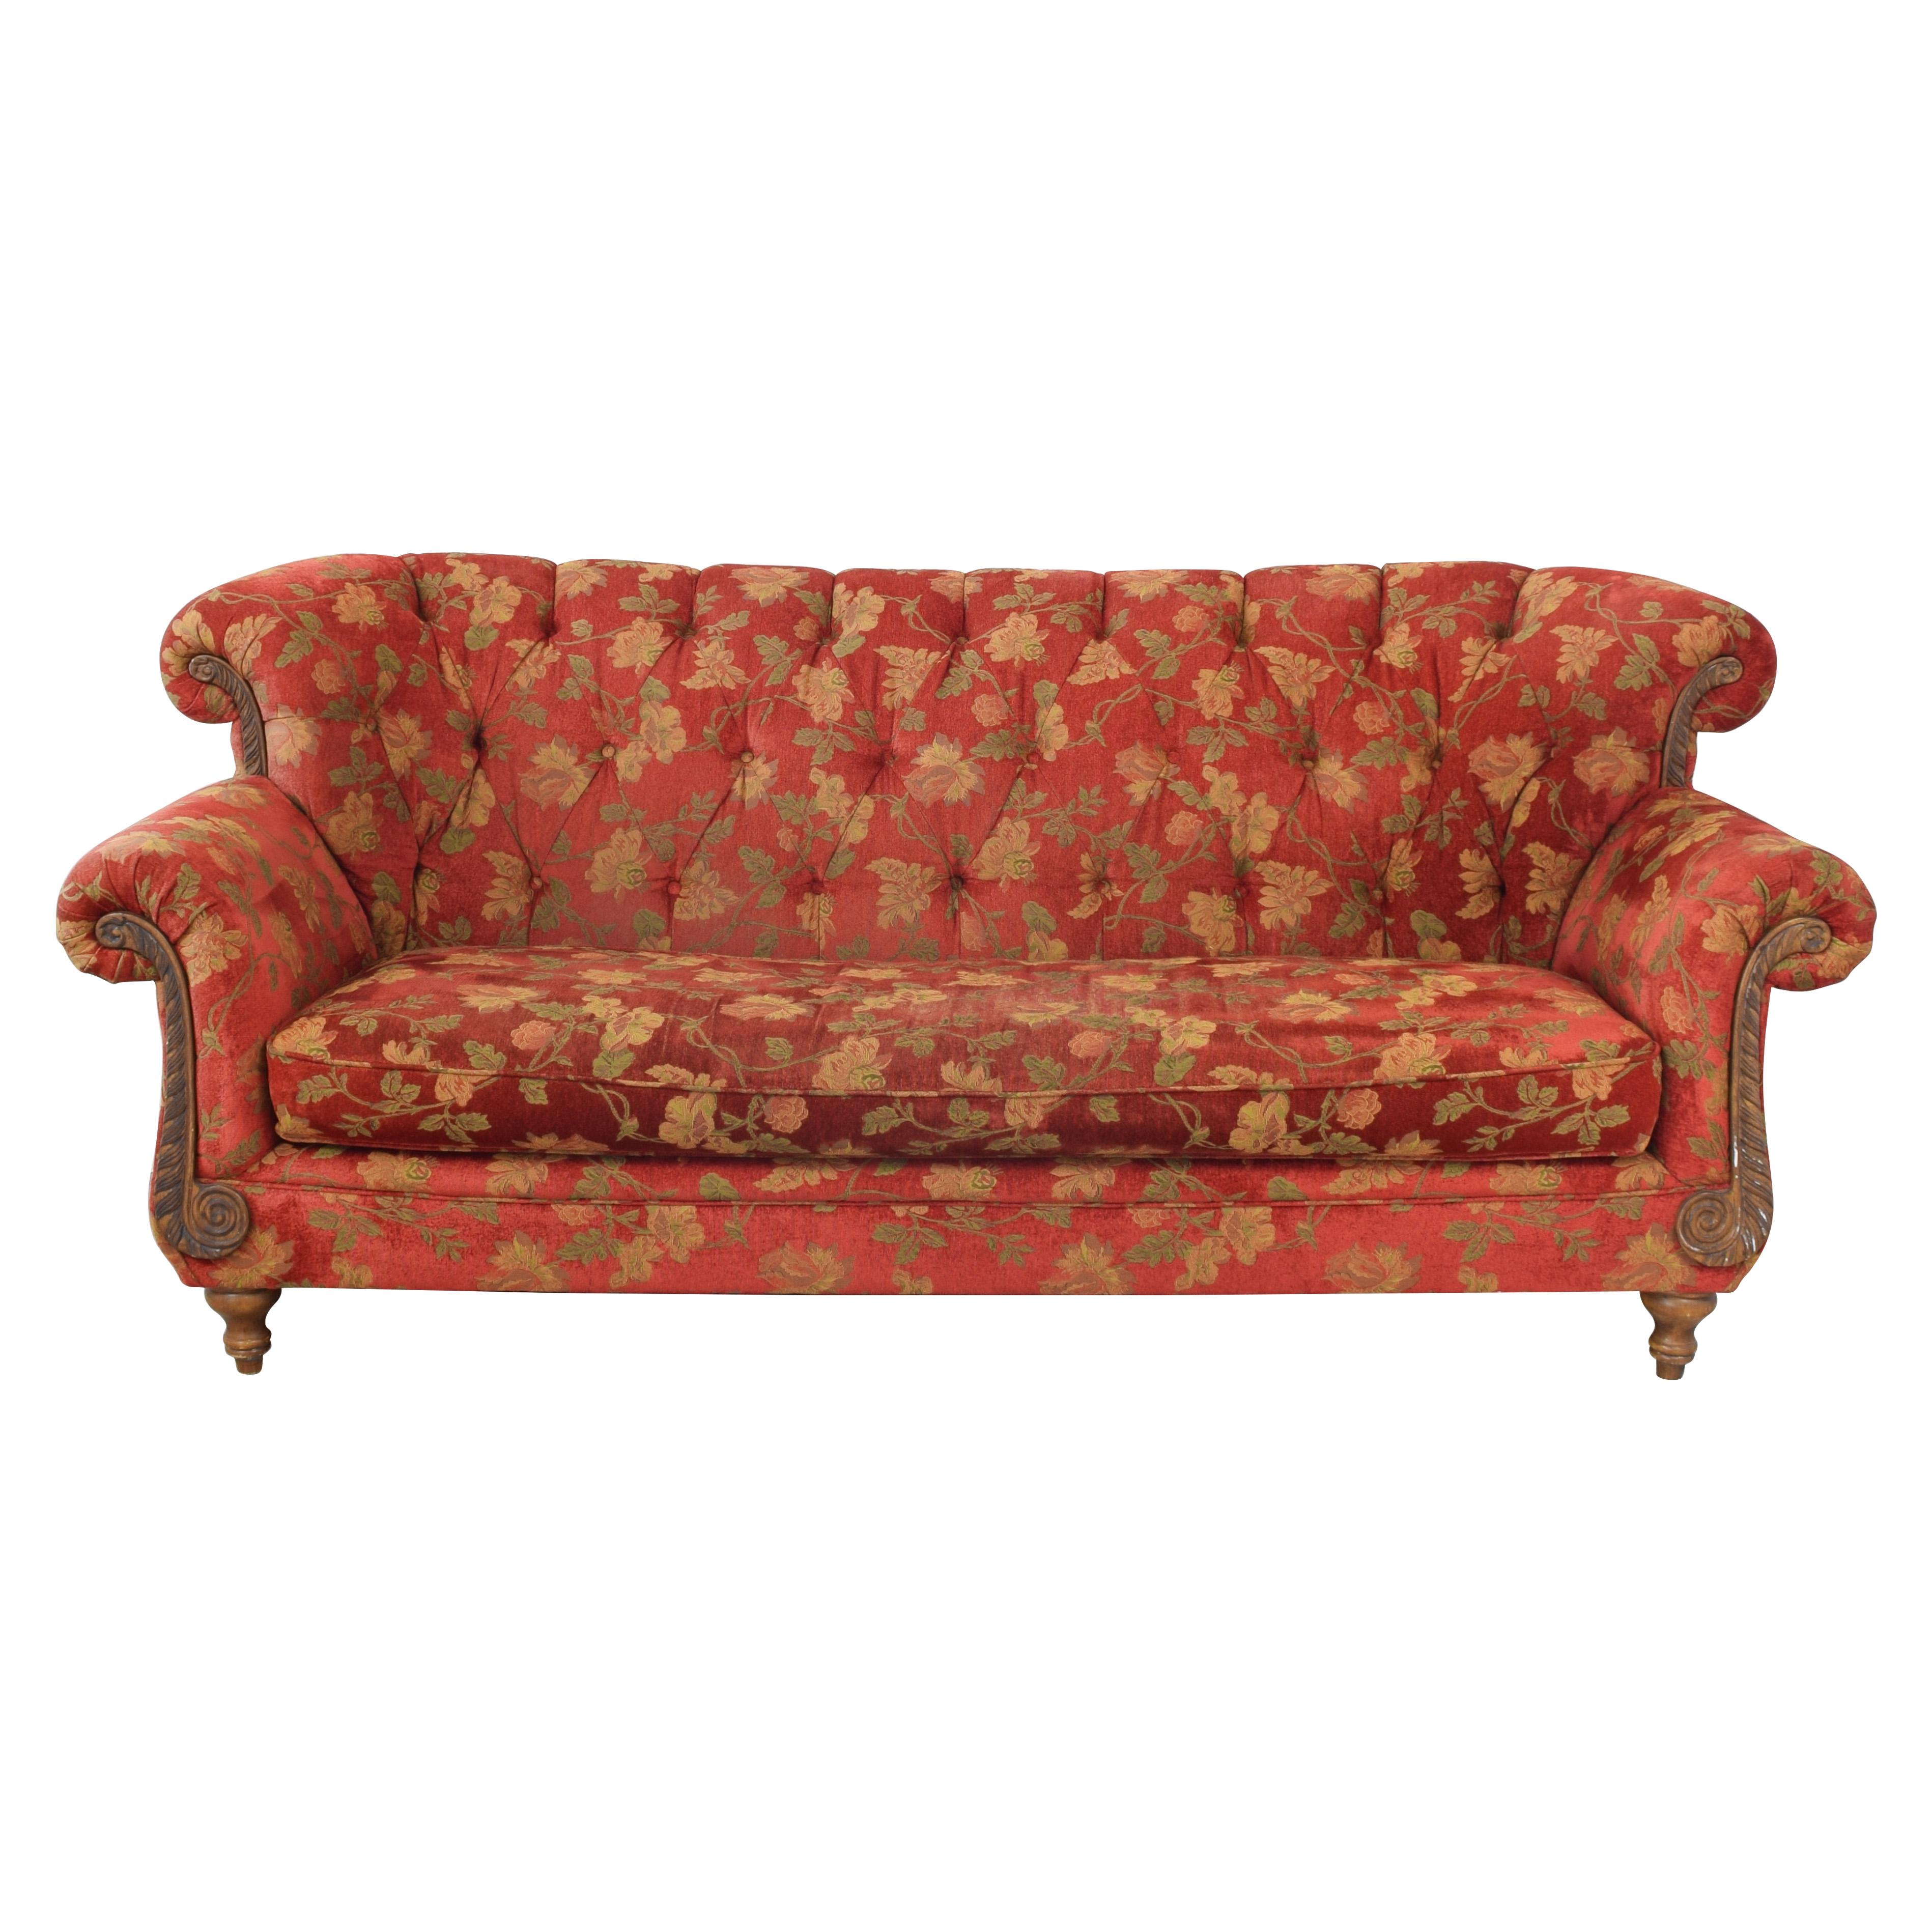 Southern Furniture of Conover Southern Furniture Calcutta Sofa second hand